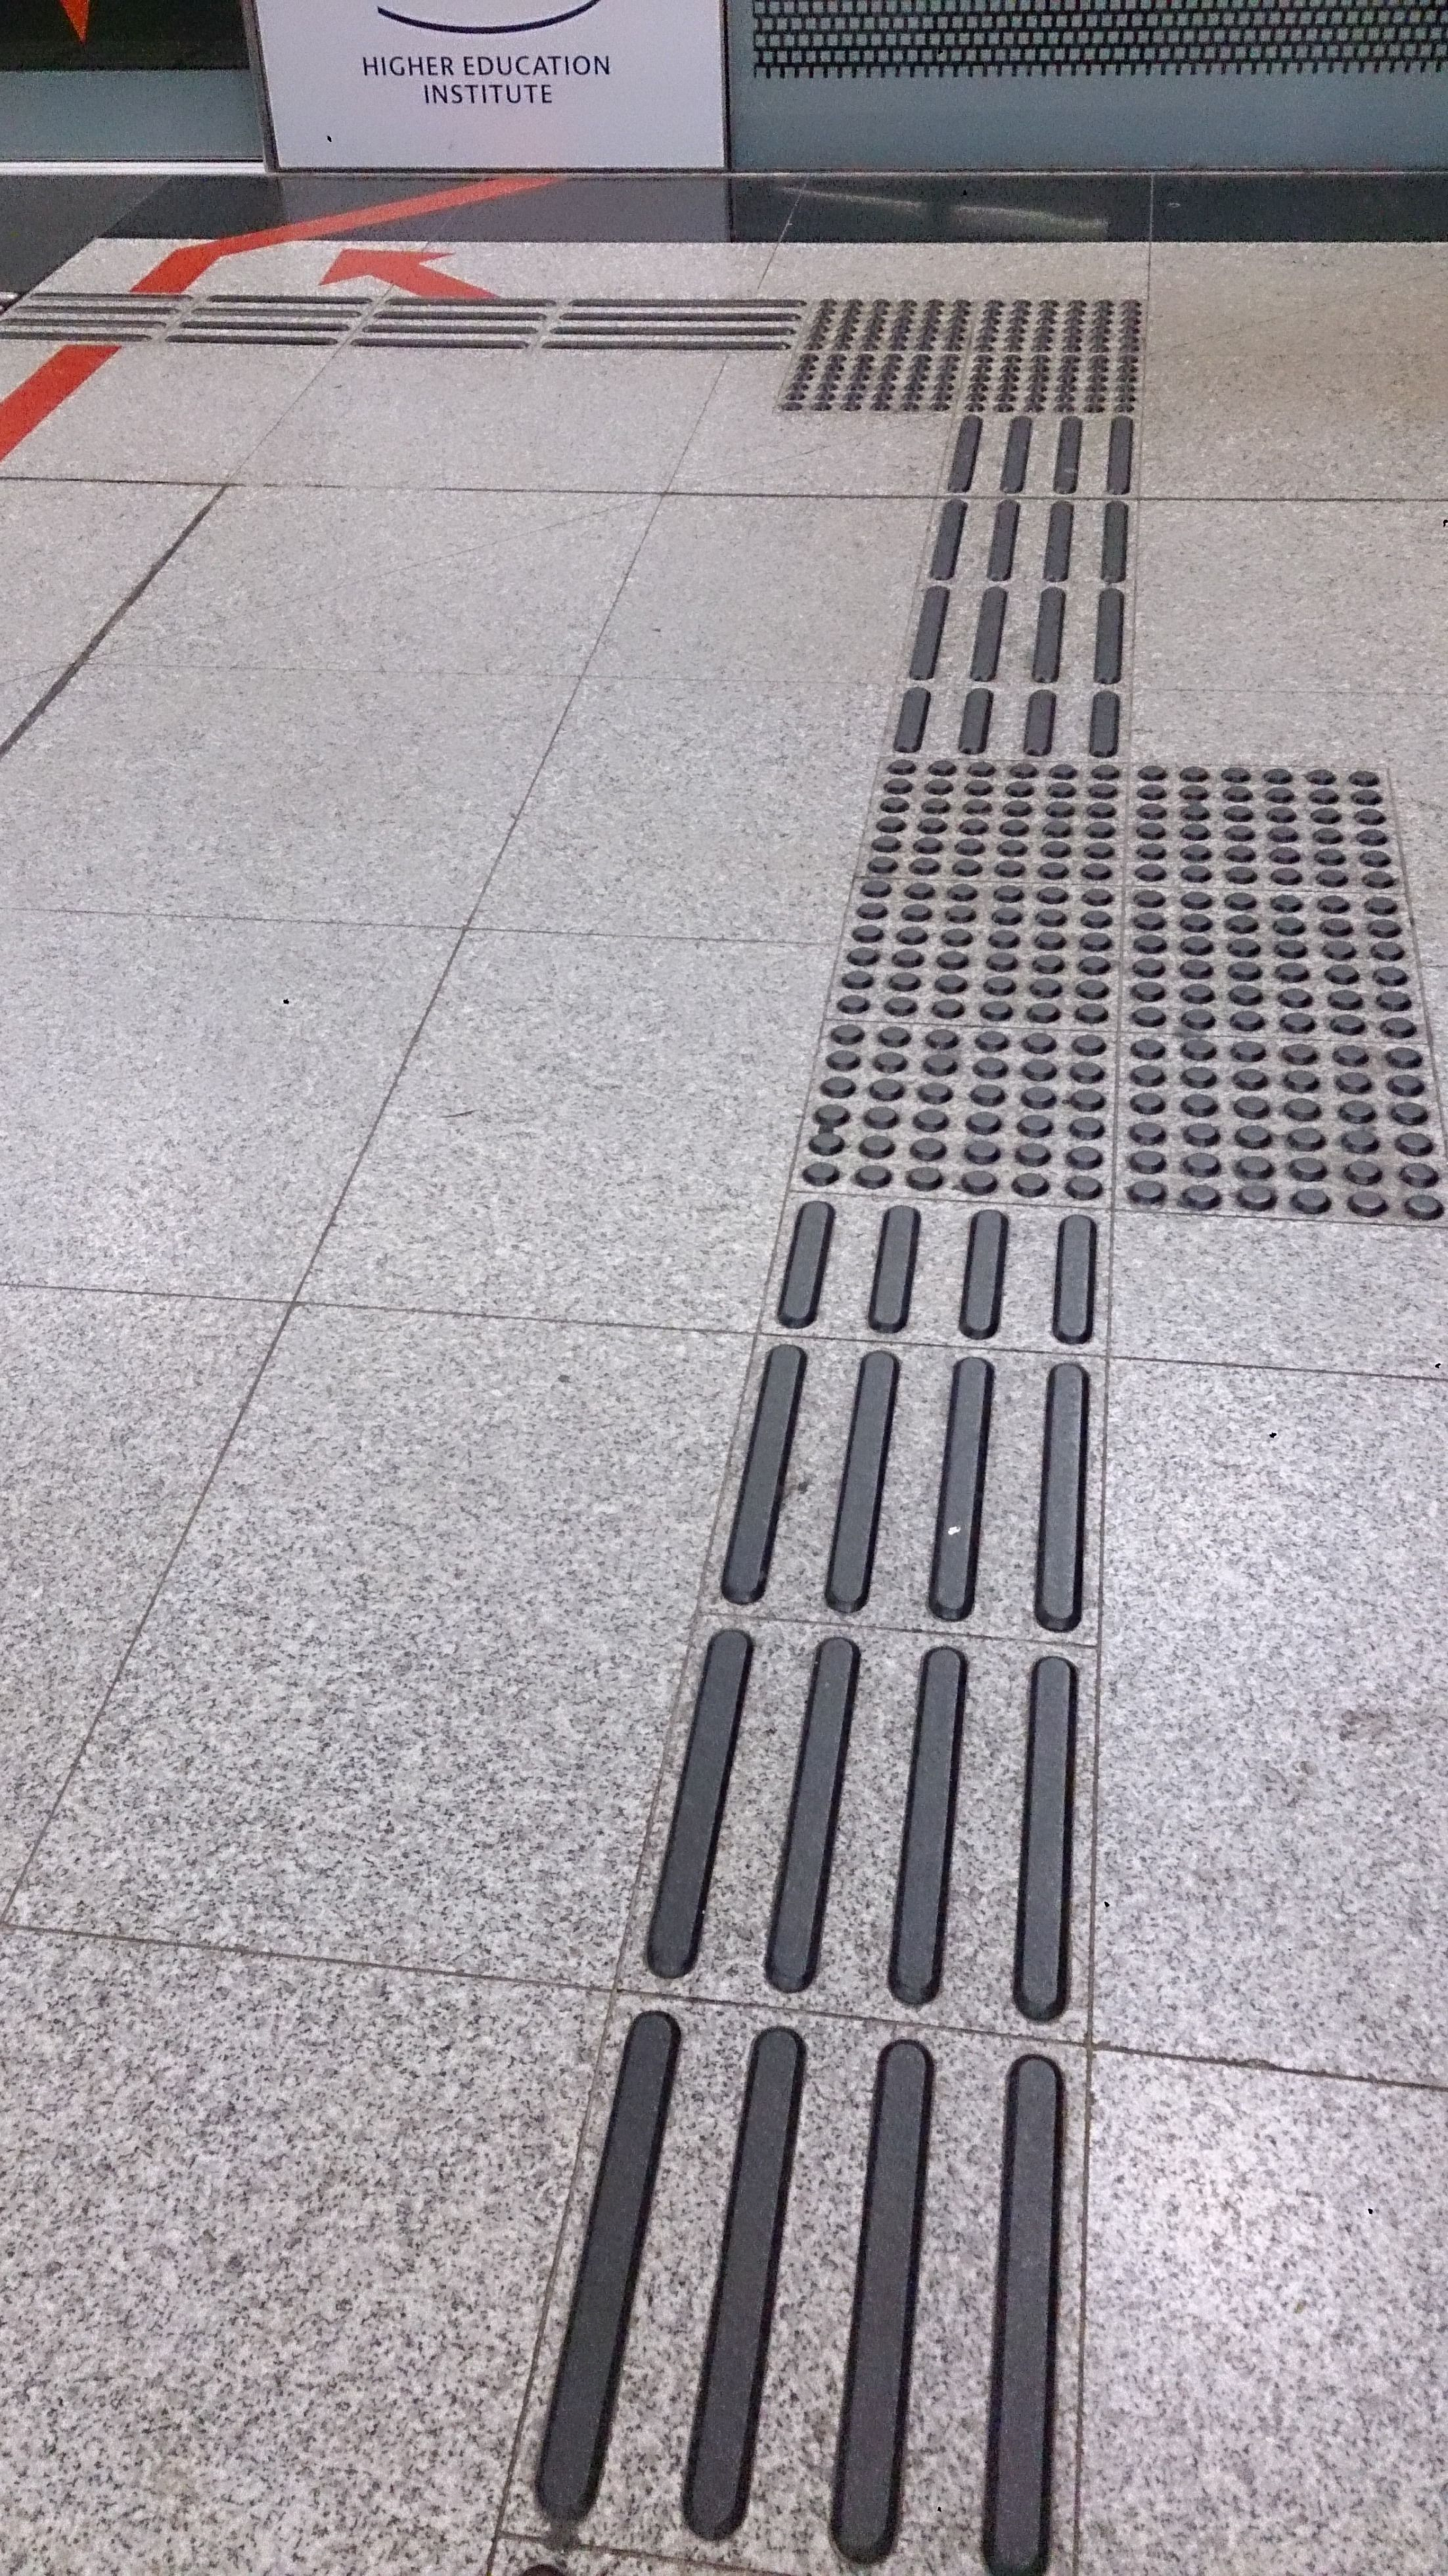 Tactile Paving In A Mass Rapid Transit Station In Singapore 20131105 Tactile Paving Blinds Design Living Room Carpet